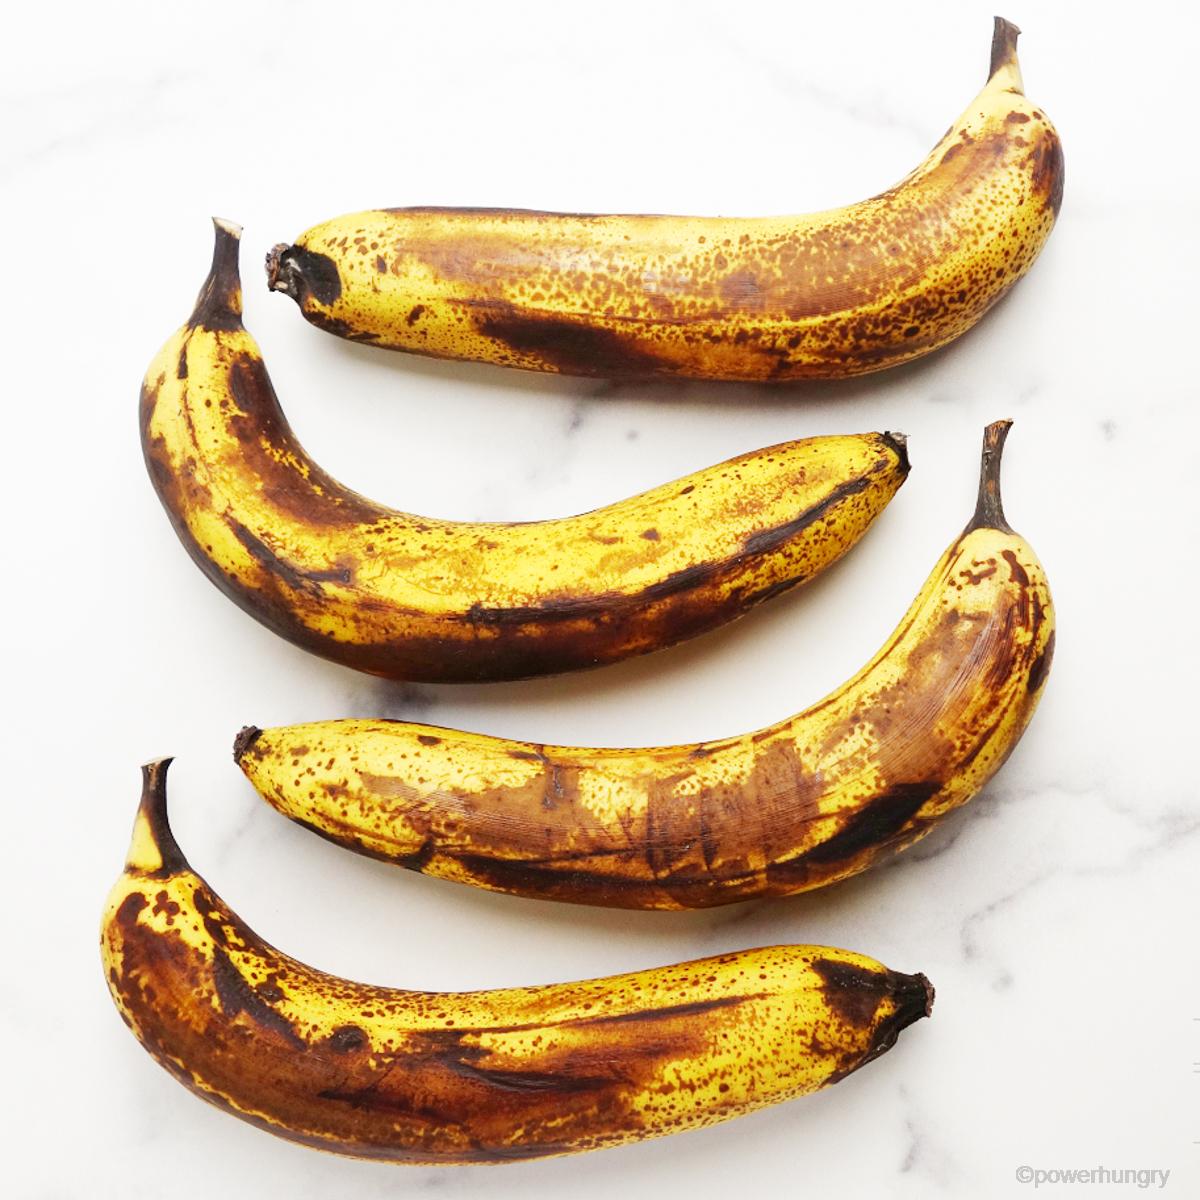 overead shot of 4 very ripe bananas